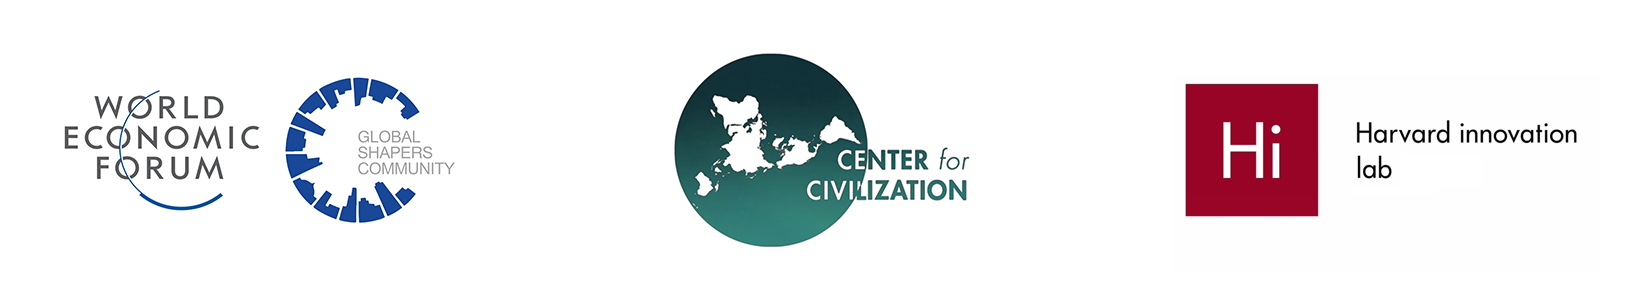 affiliations-logo-4.png